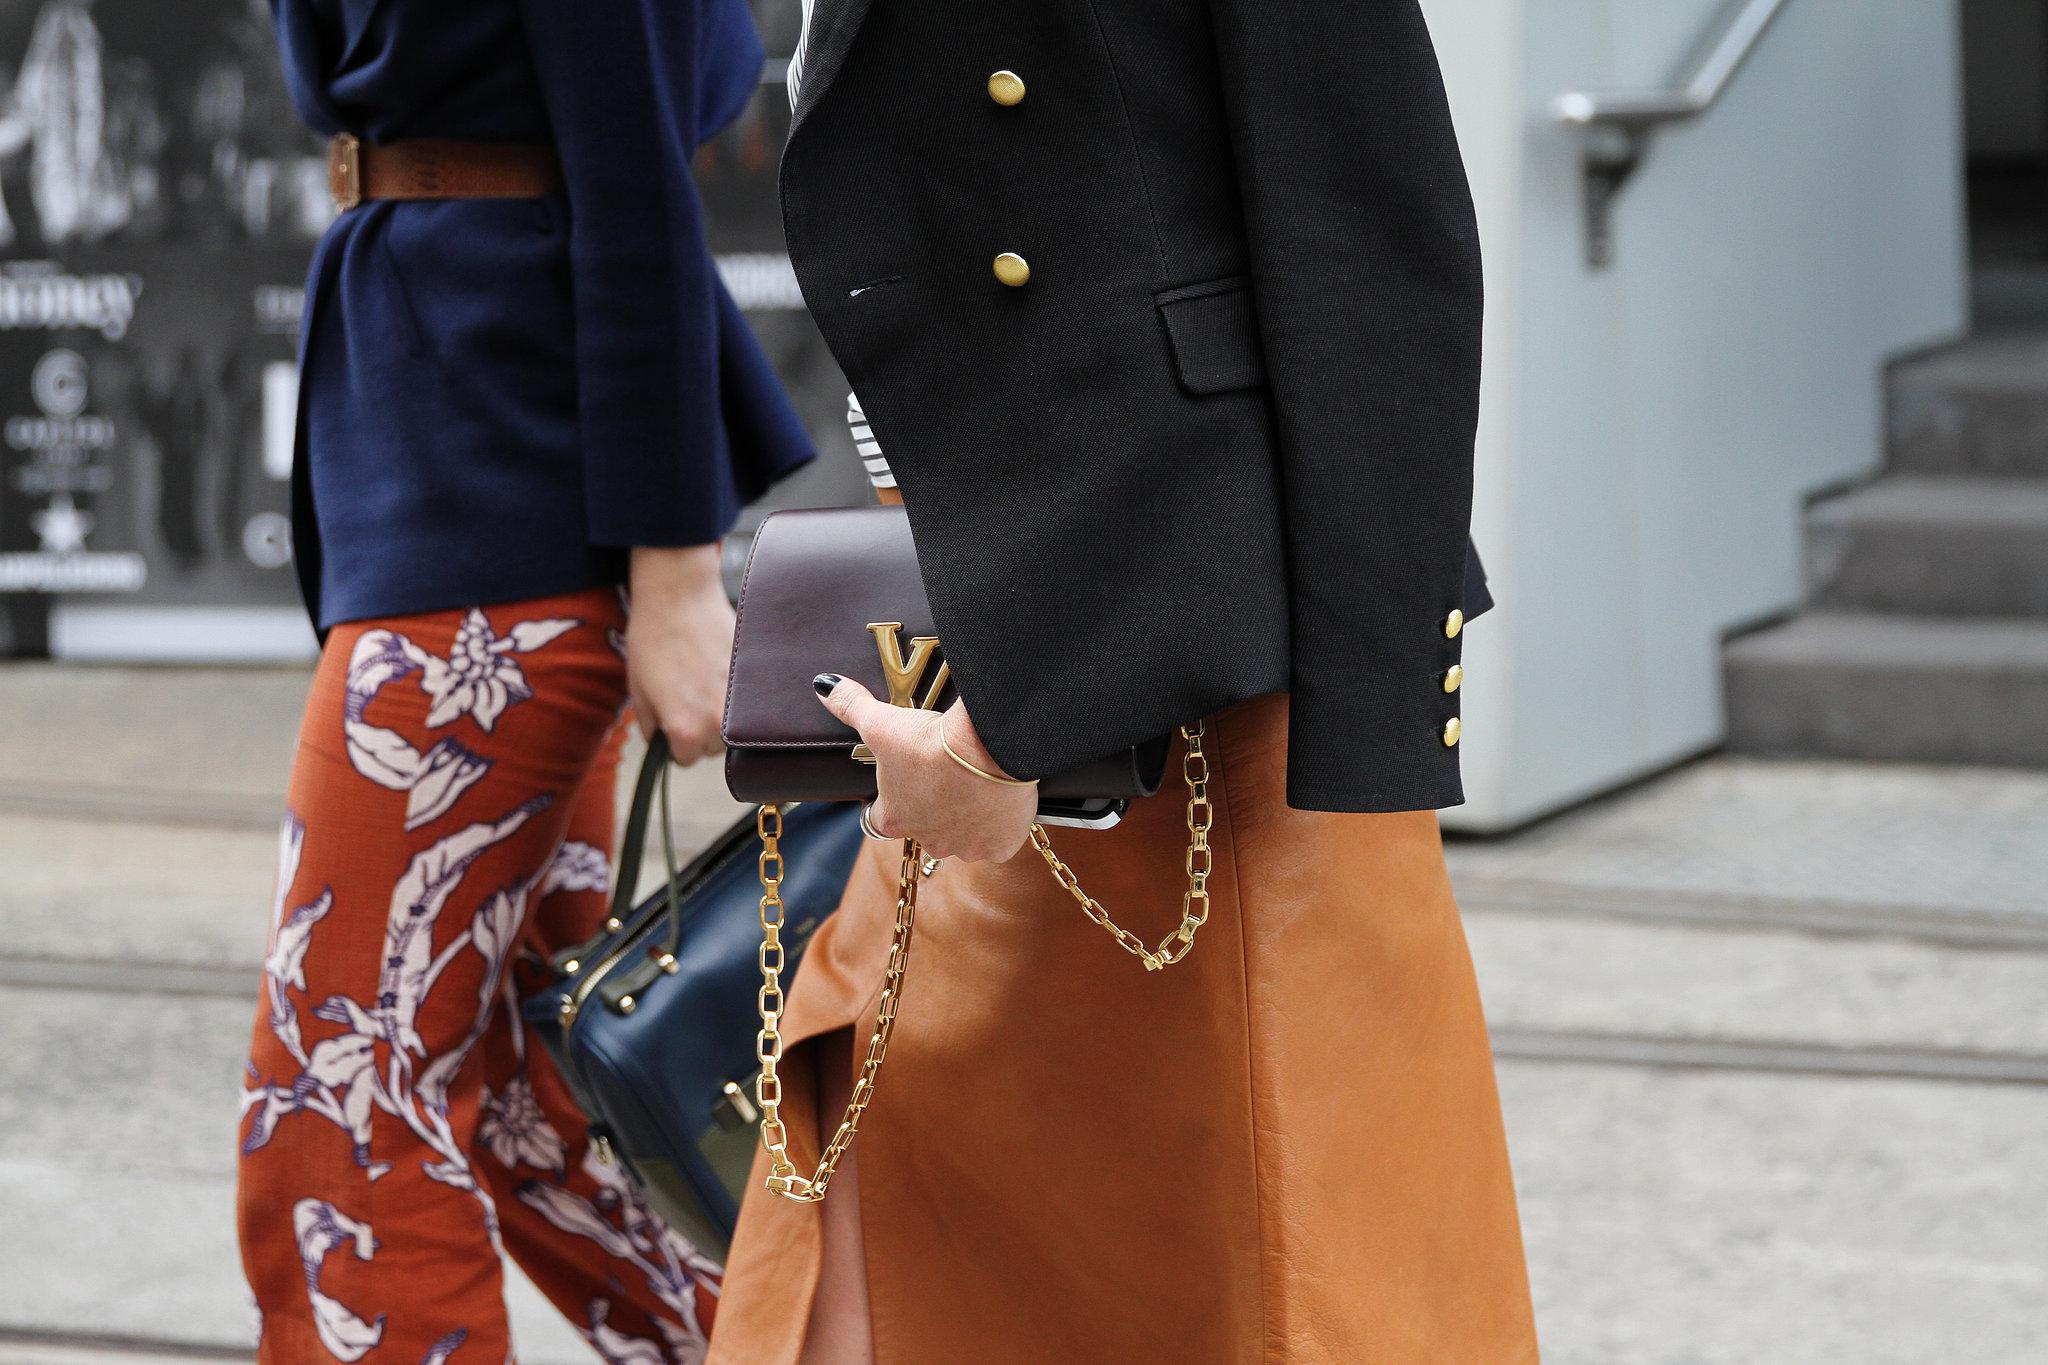 street-style-accessories-2015-mbfwa-fashion-week-australia.jpg